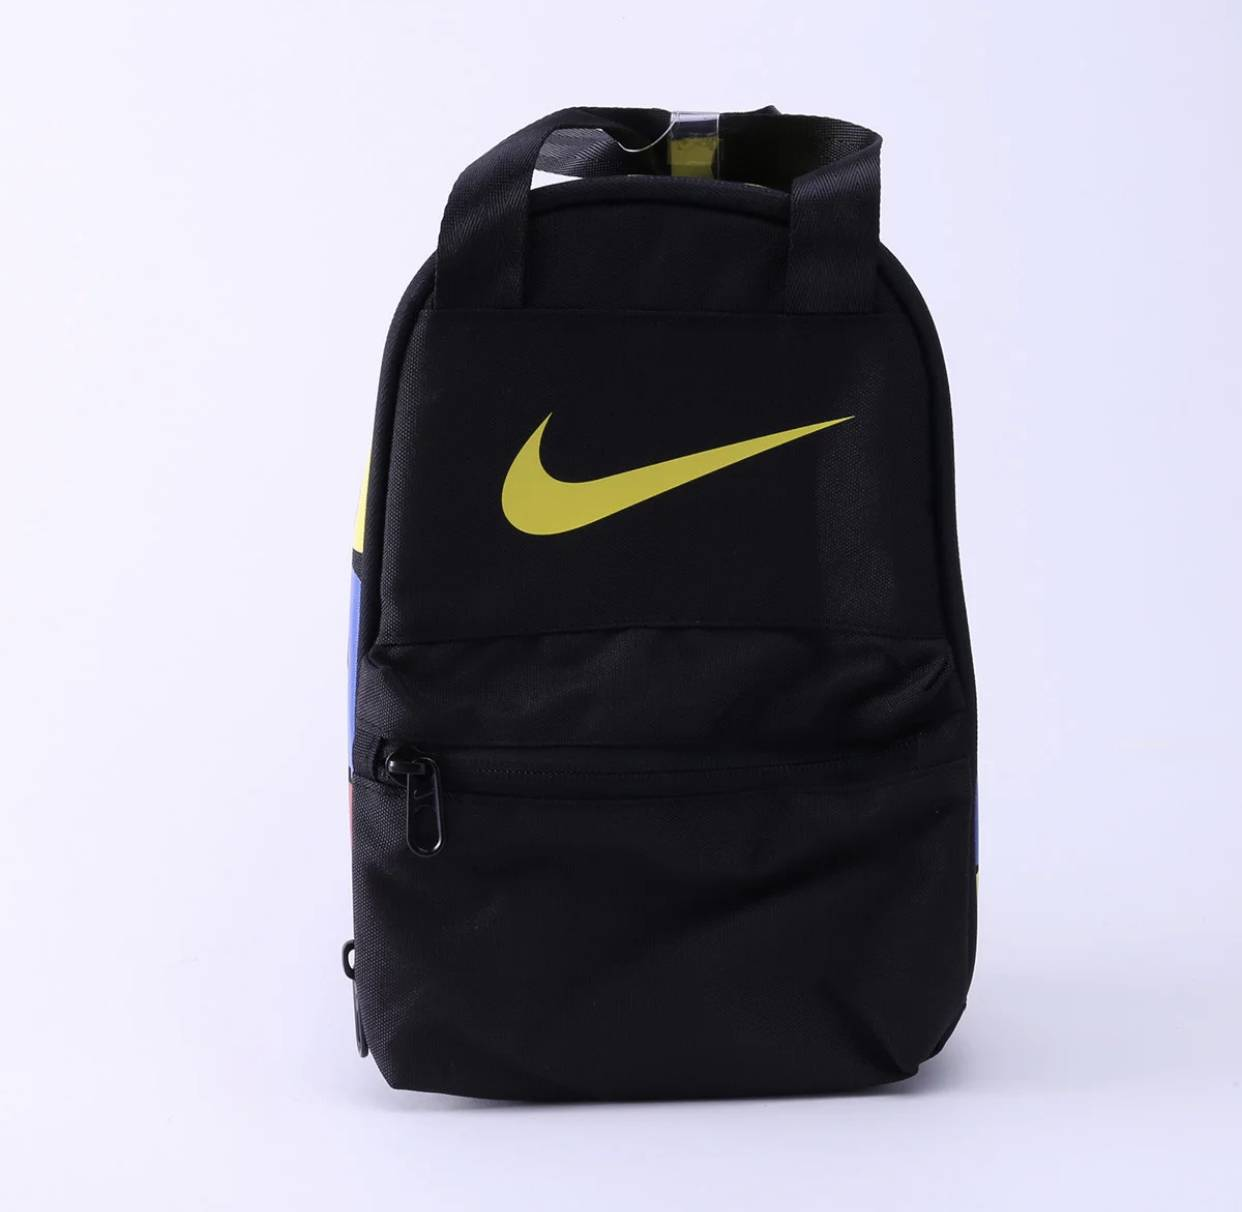 NIKE 耐克 83419 中性大童款 经典背包